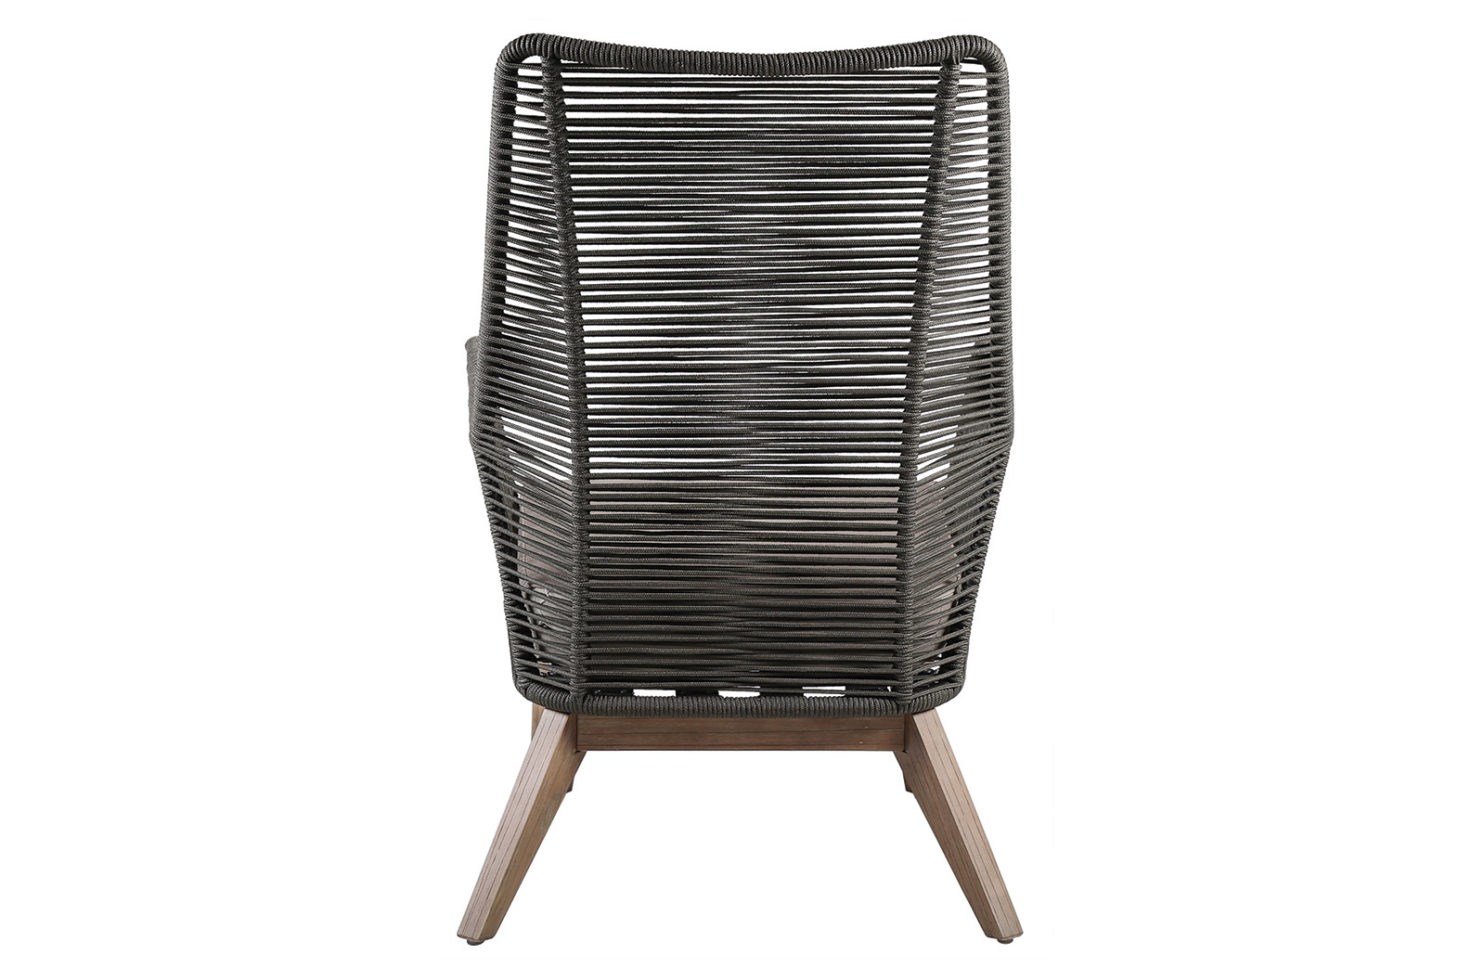 marco polo lounge chair 504FT415P2 E 1 back